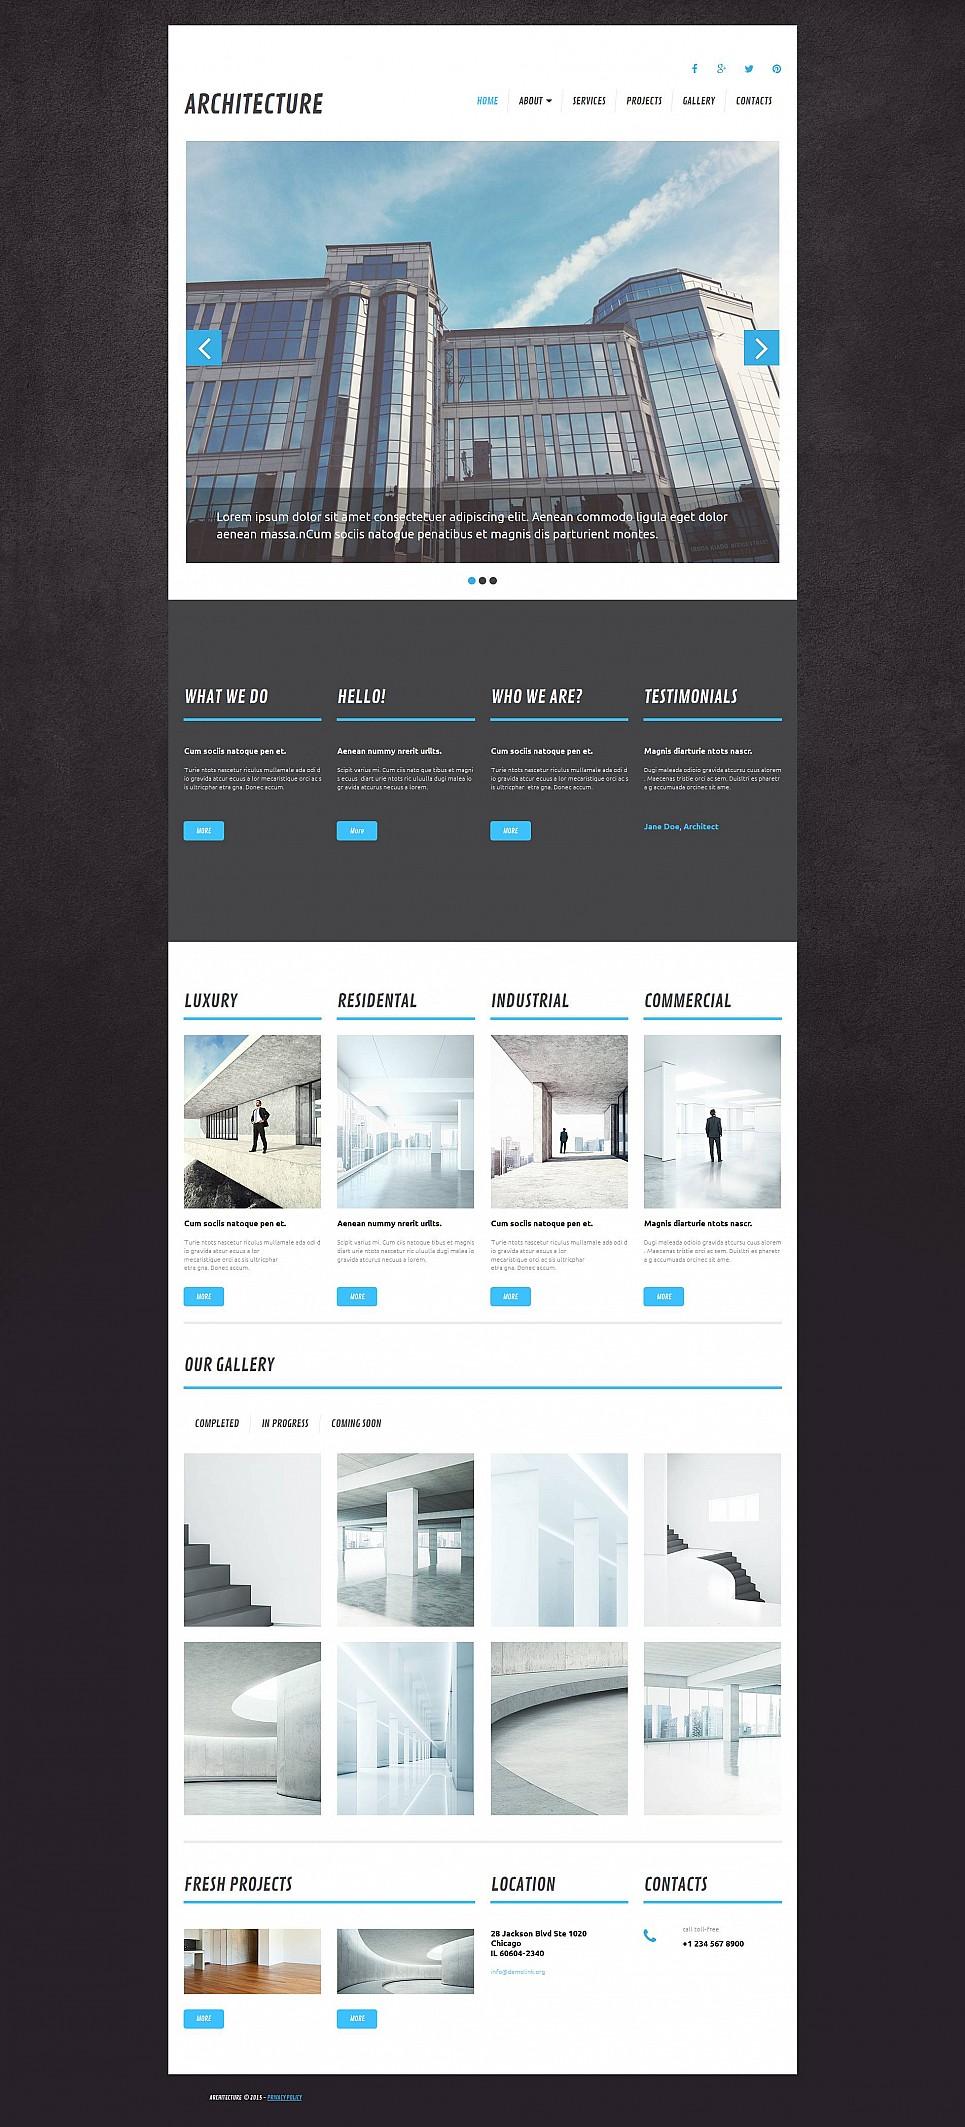 Architect Site Design - image